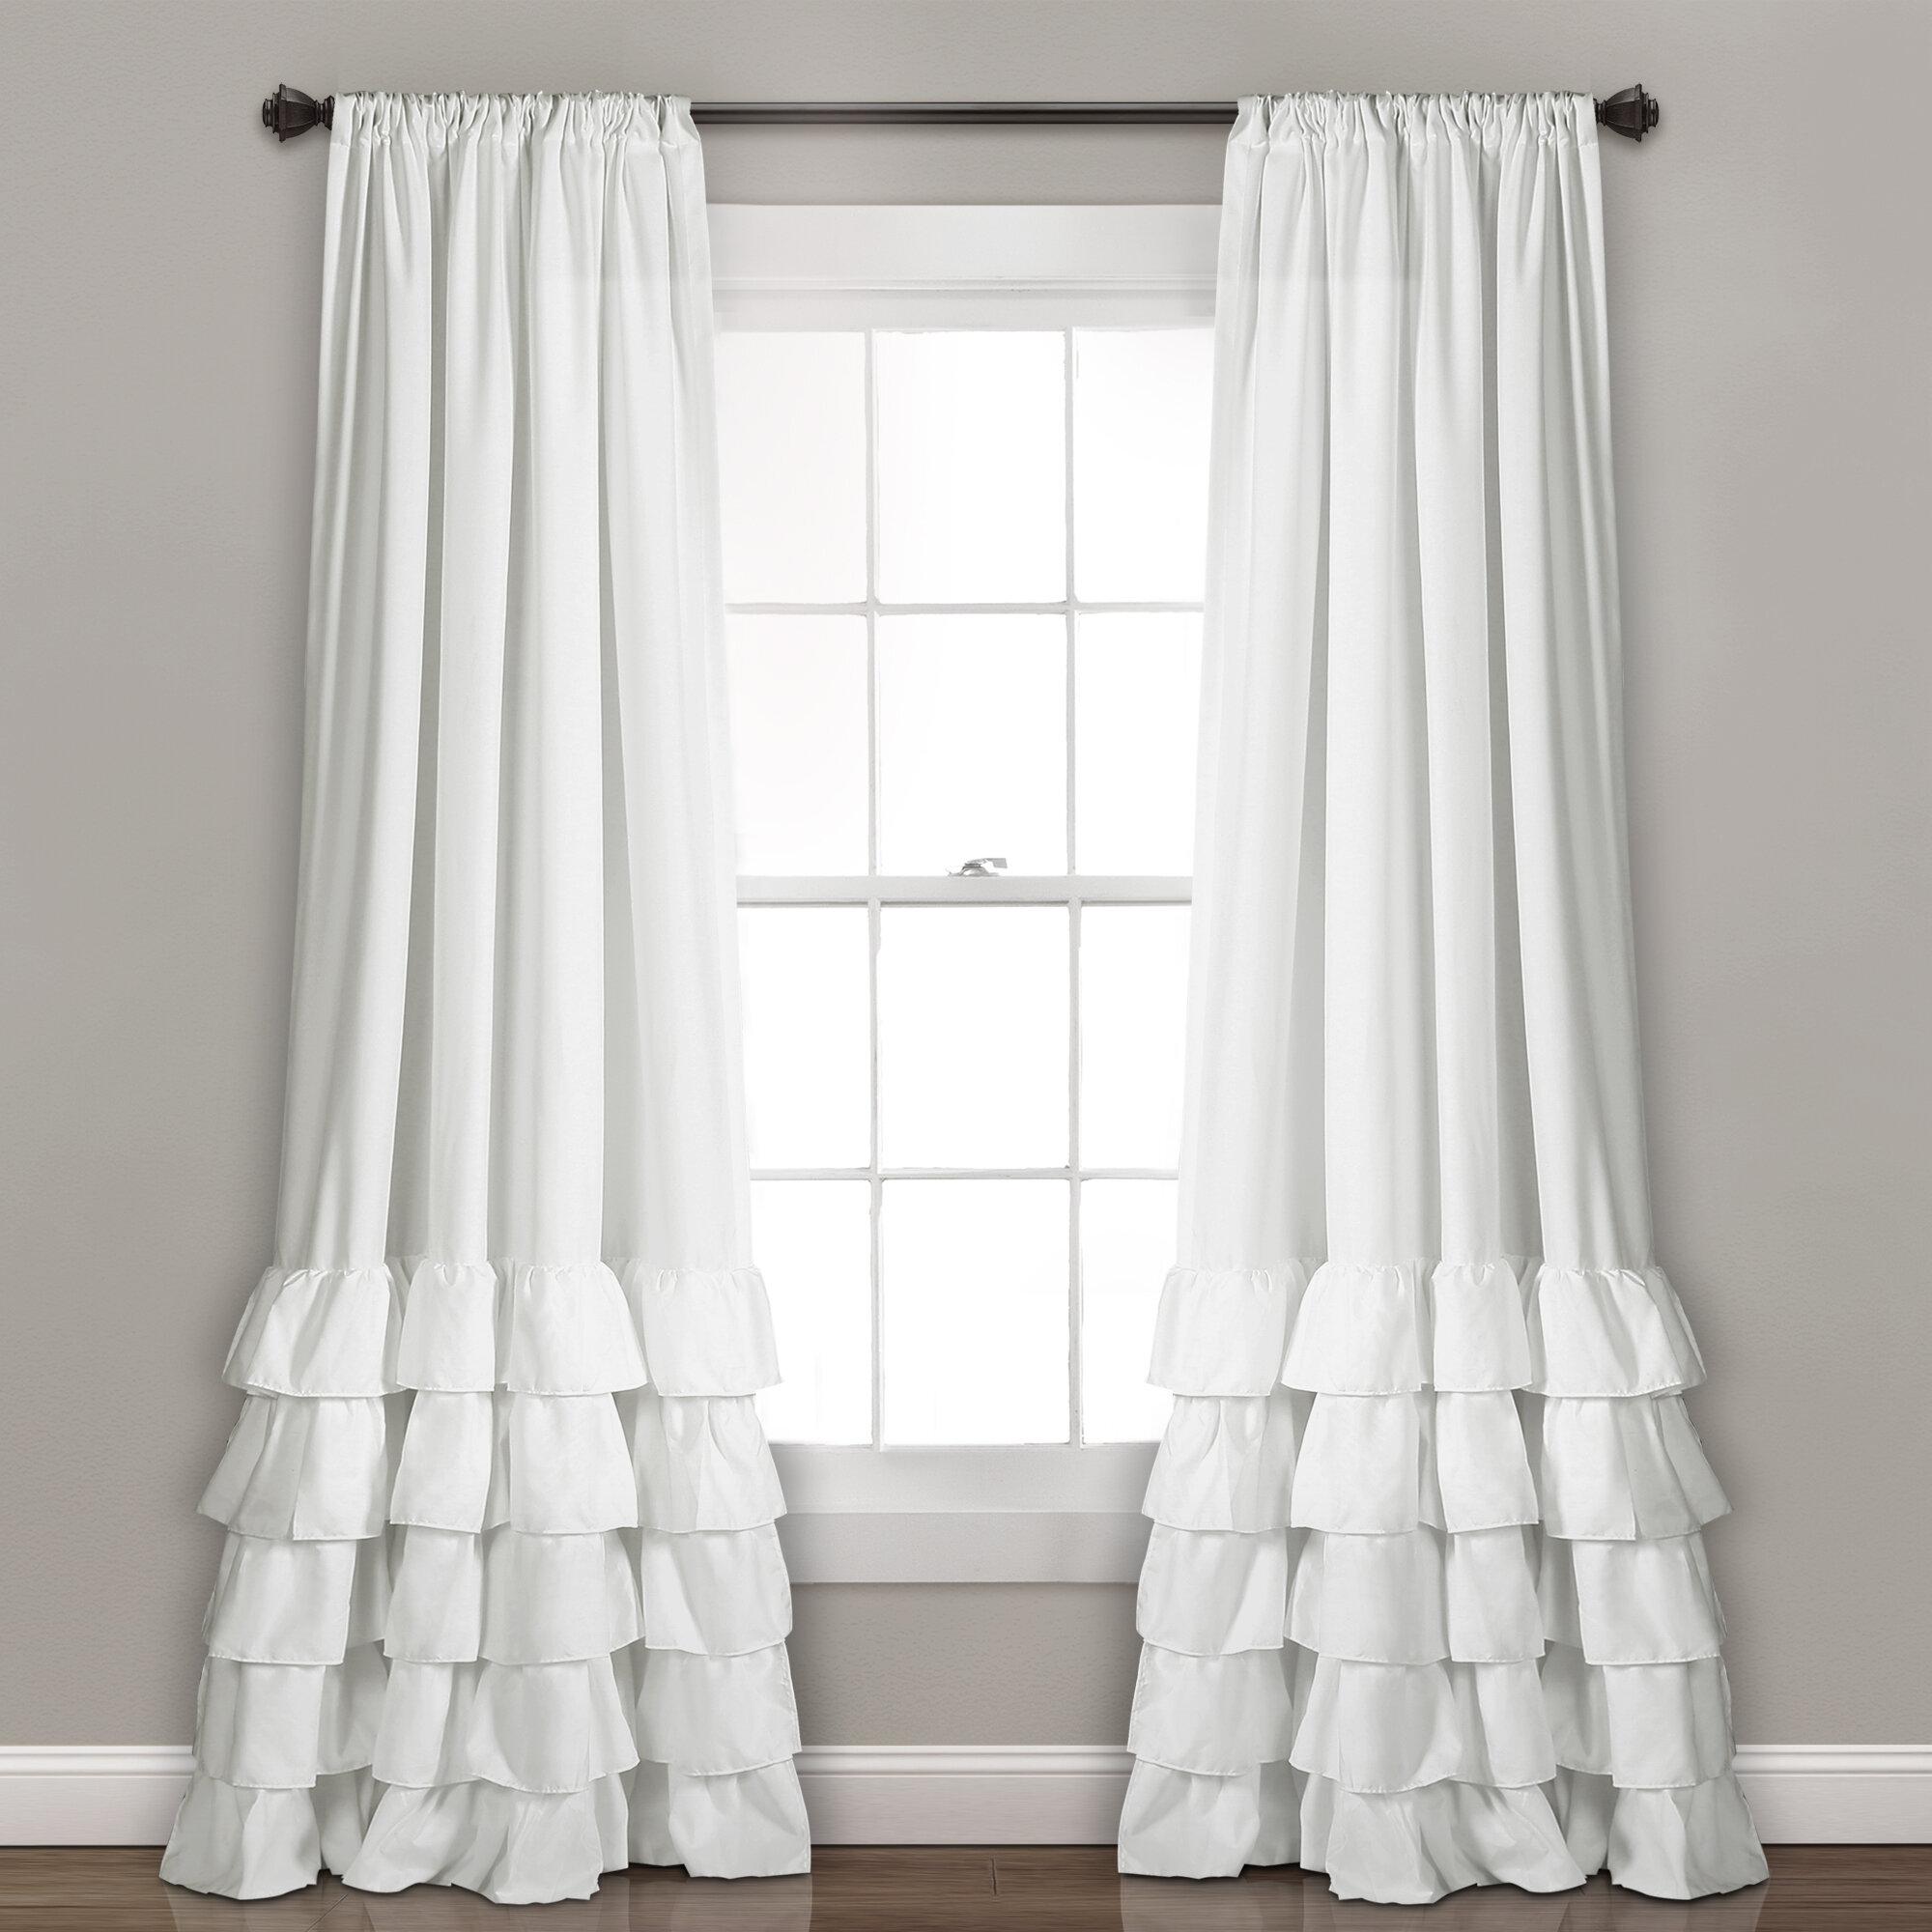 decoration minimalist ruffle ideas for modern target curtain panel home curtains unique xhilaration ruffled